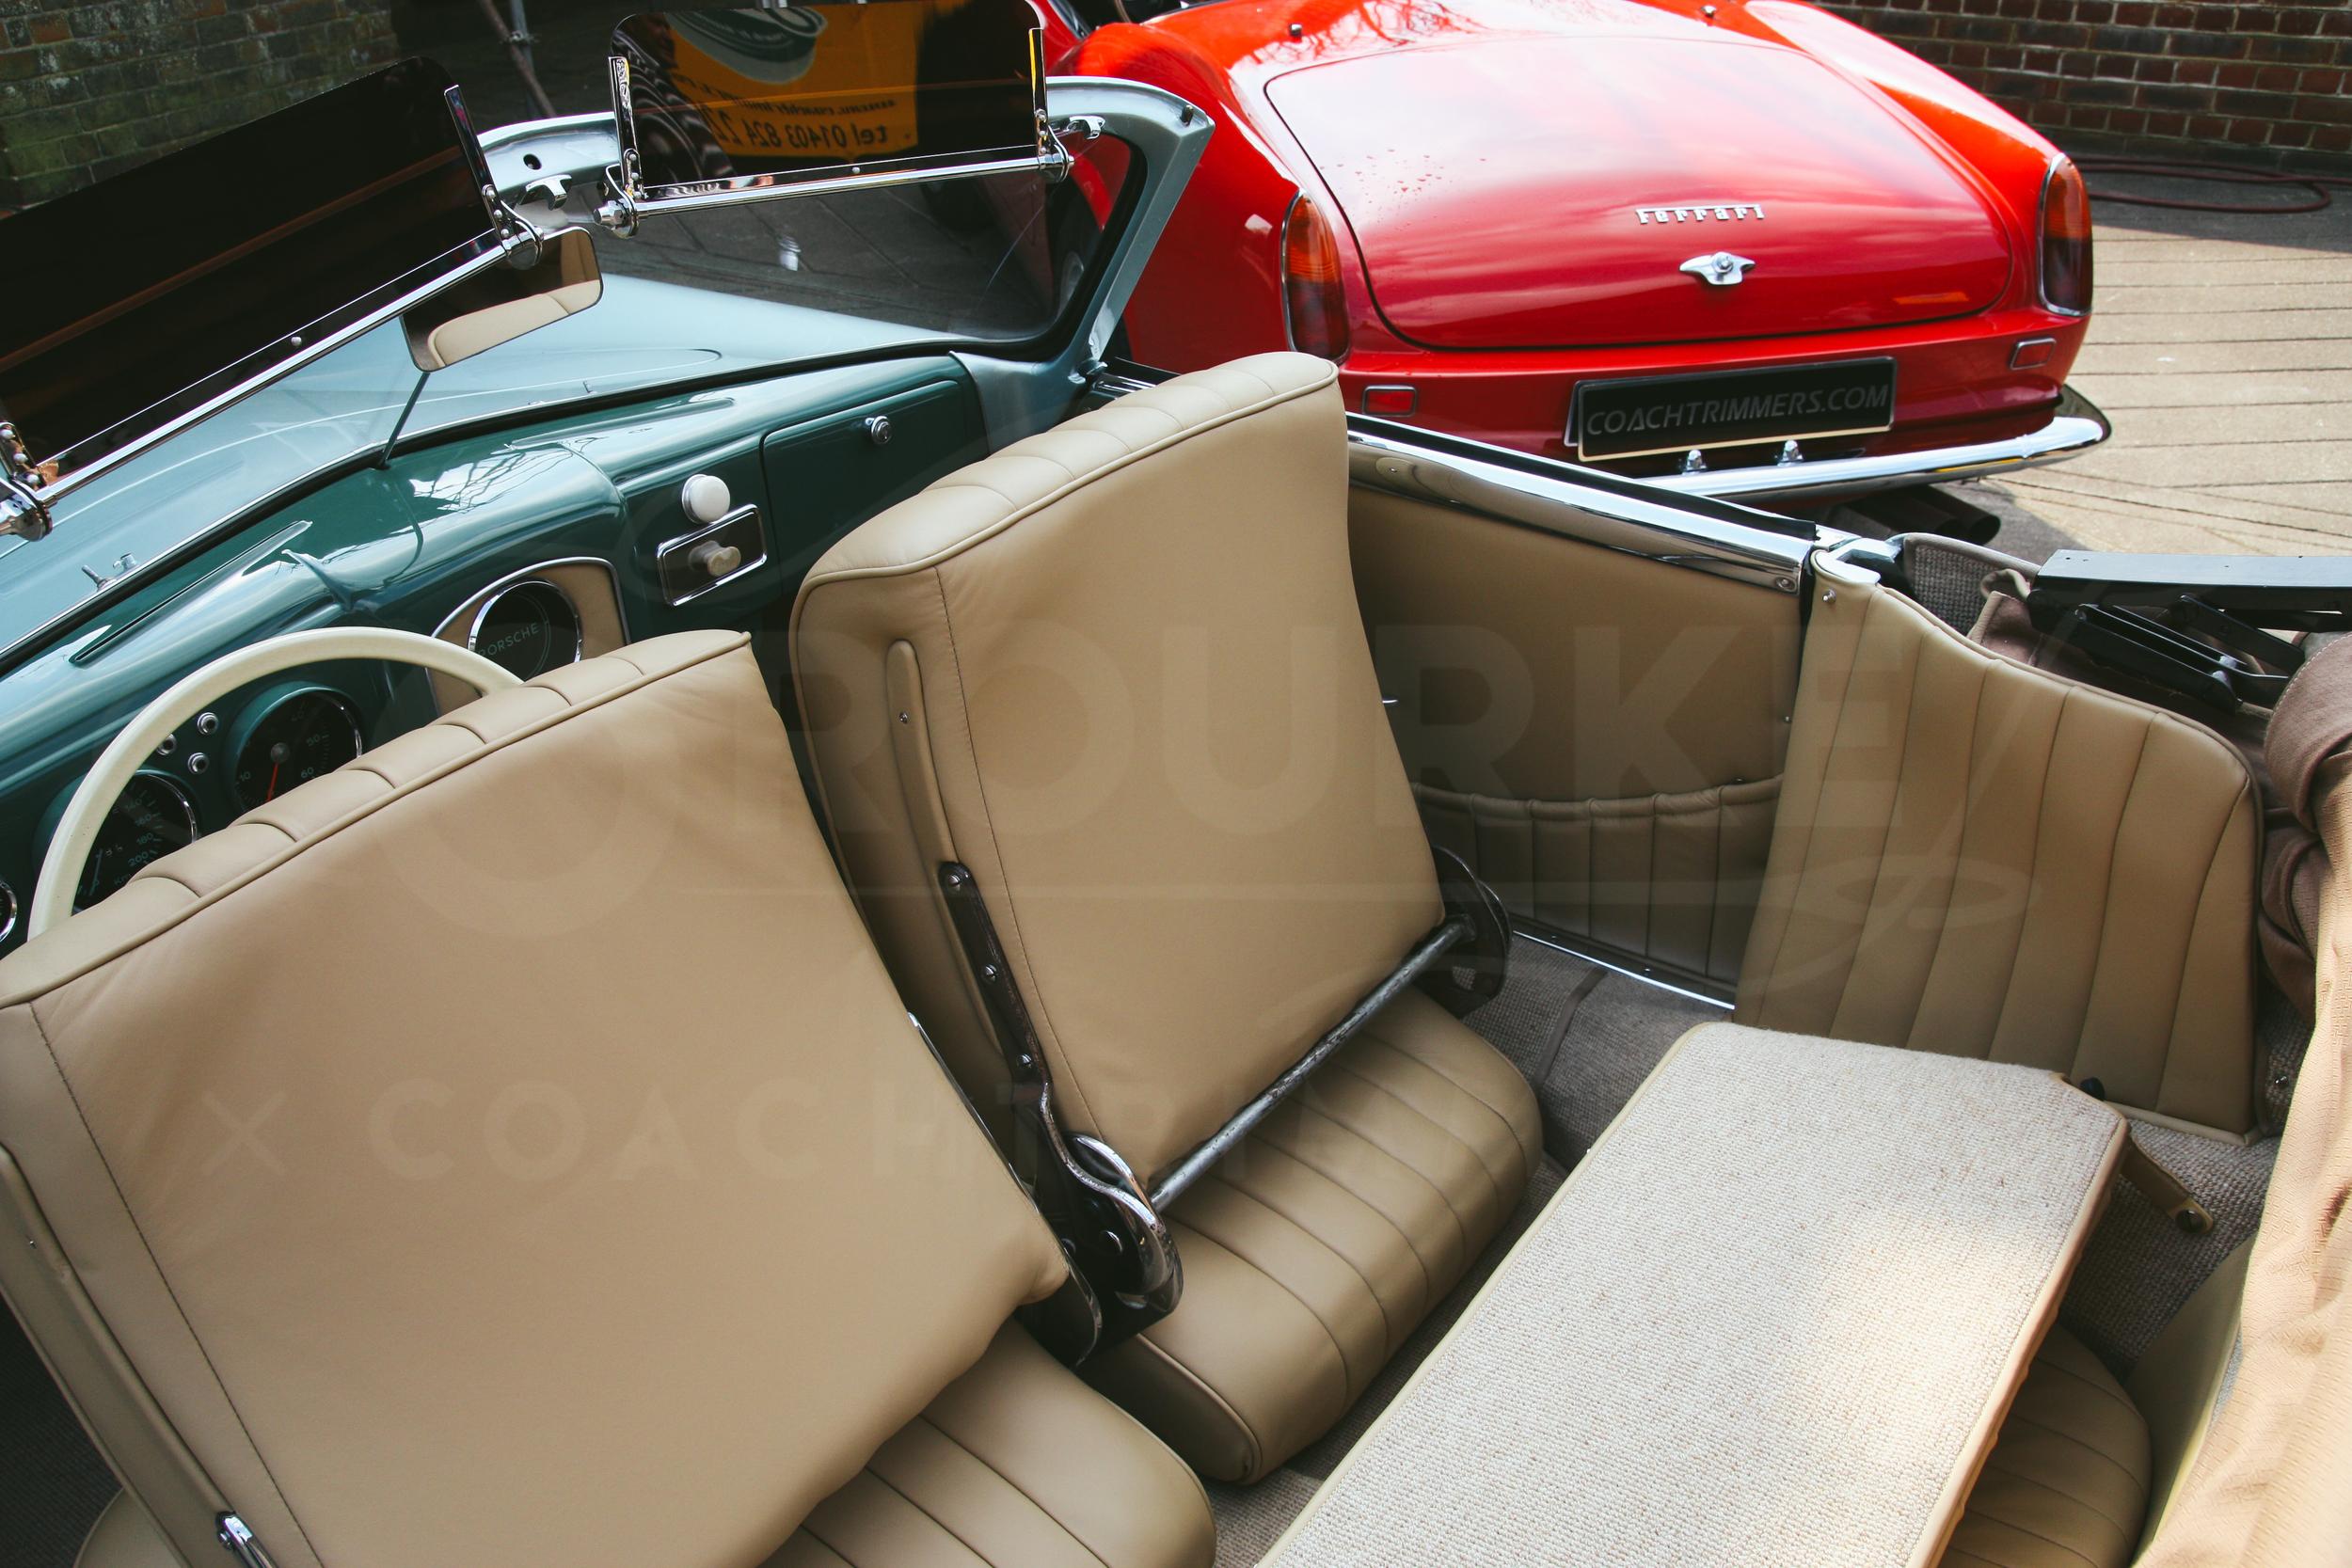 o-rourke-coachtrimmers-porsche-356-cabriolet-2.jpg